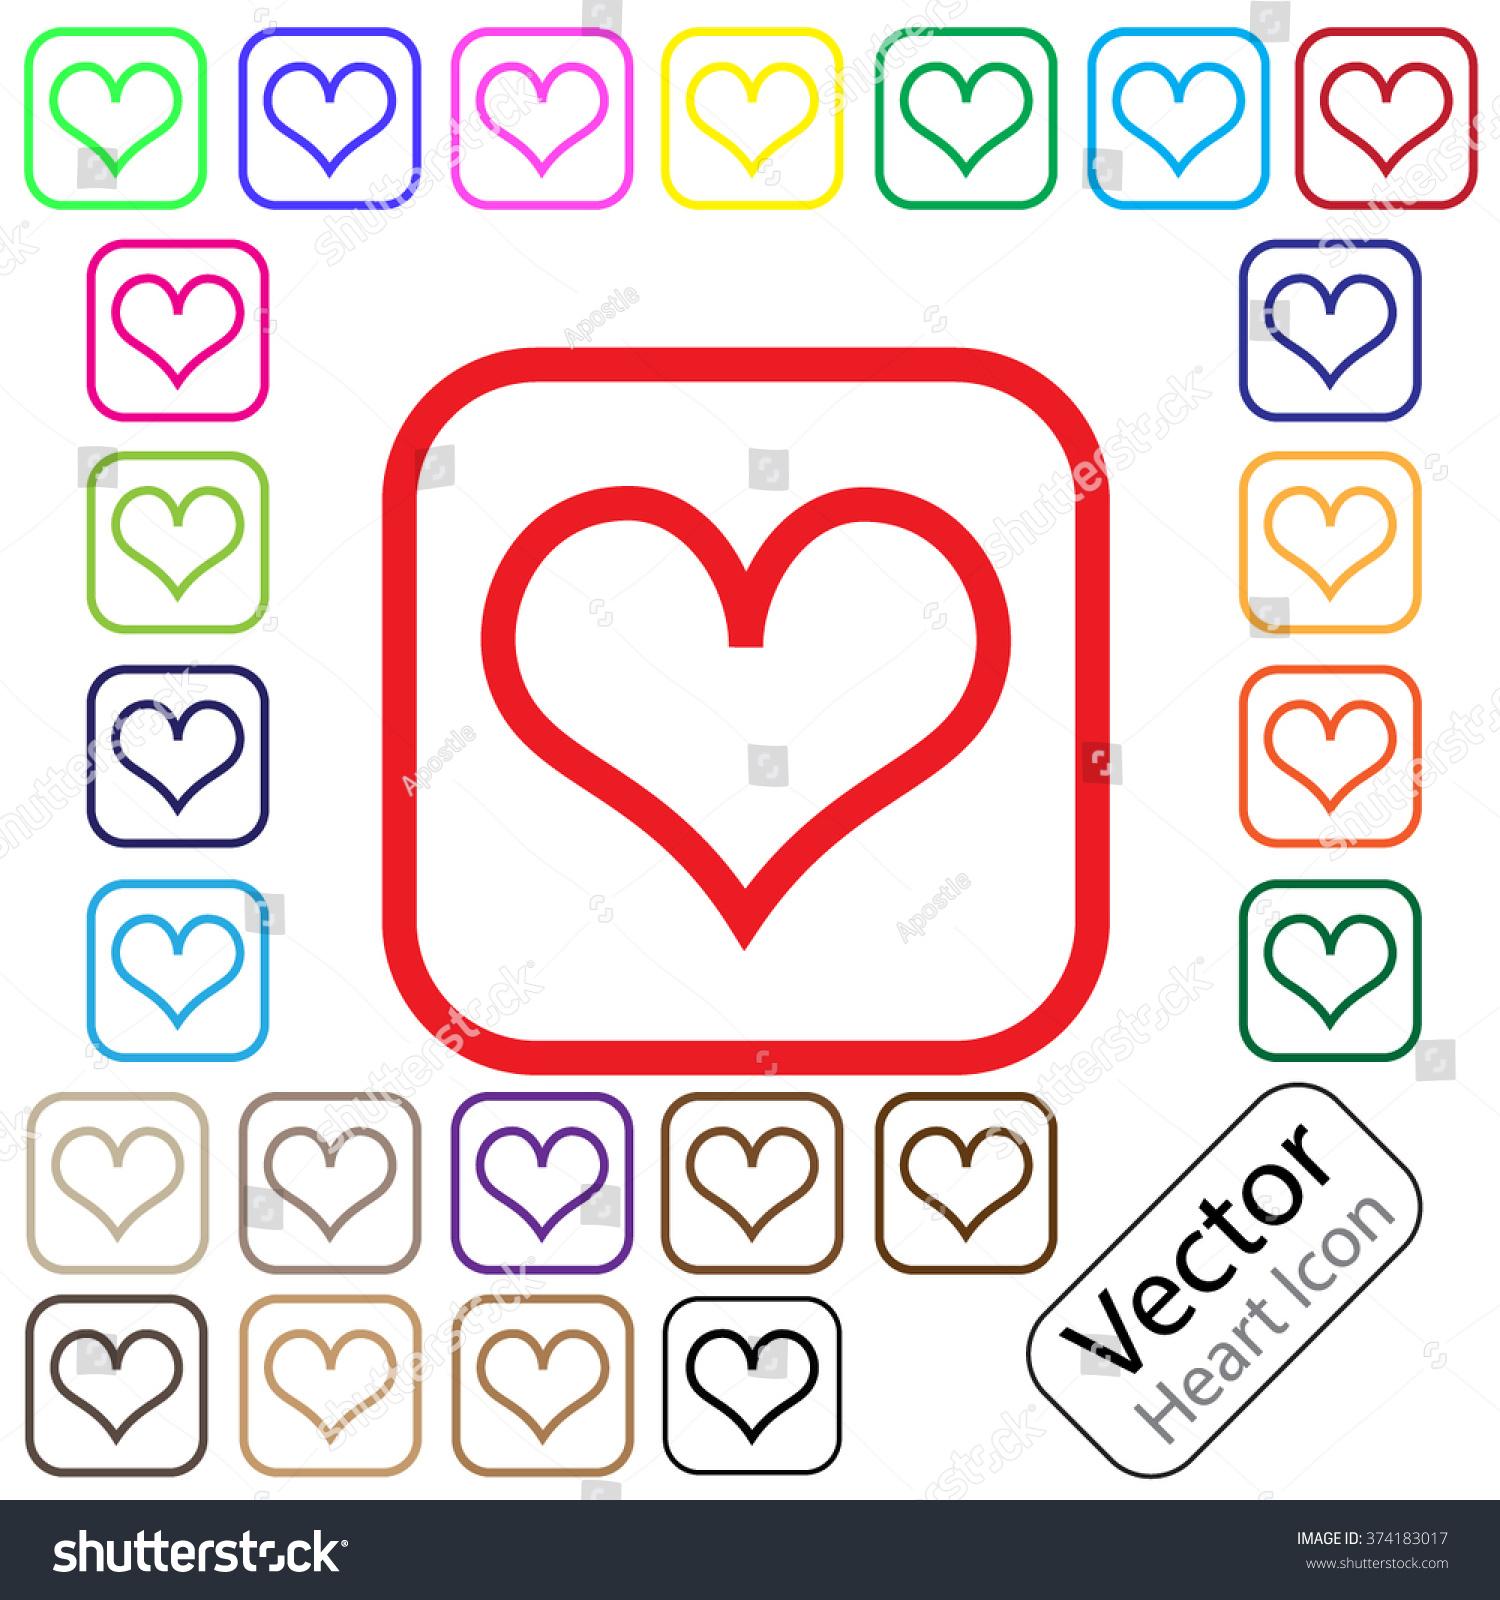 Human heart icons signs symbols love stock vector 374183017 human heart icons signs or symbols for love simple vector graphic this buycottarizona Choice Image